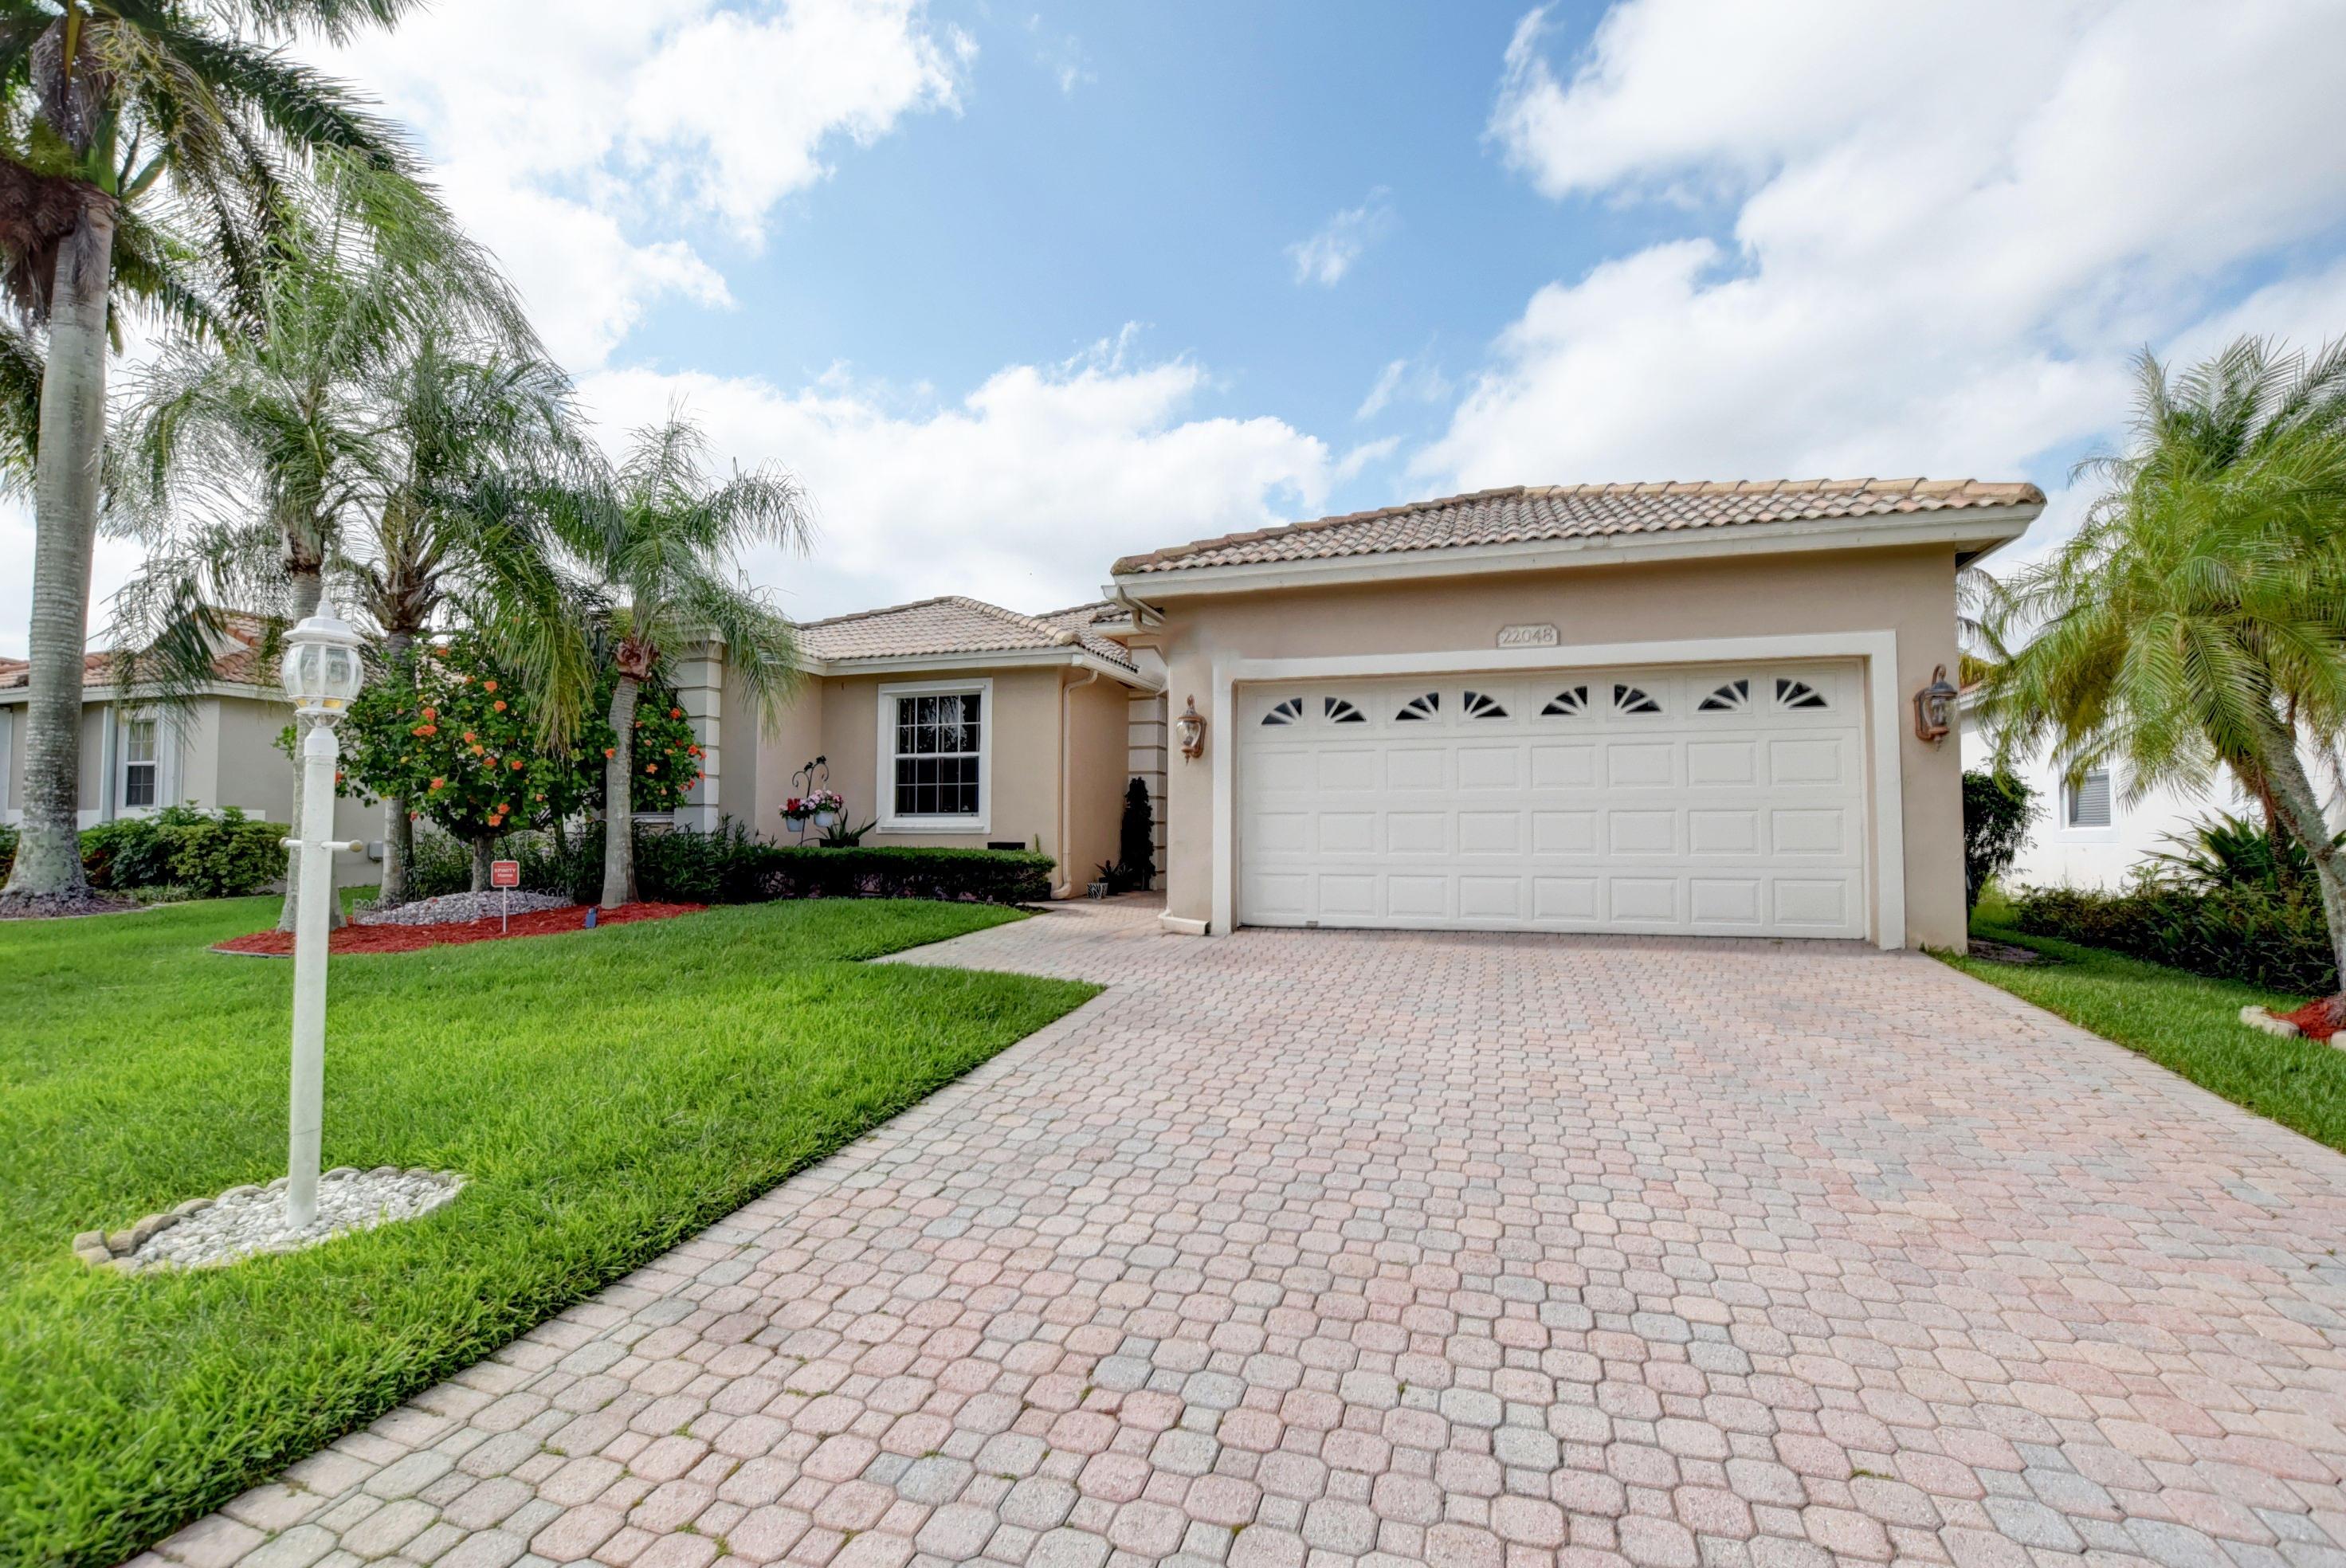 Home for sale in Boca Winds / Waterways Boca Raton Florida